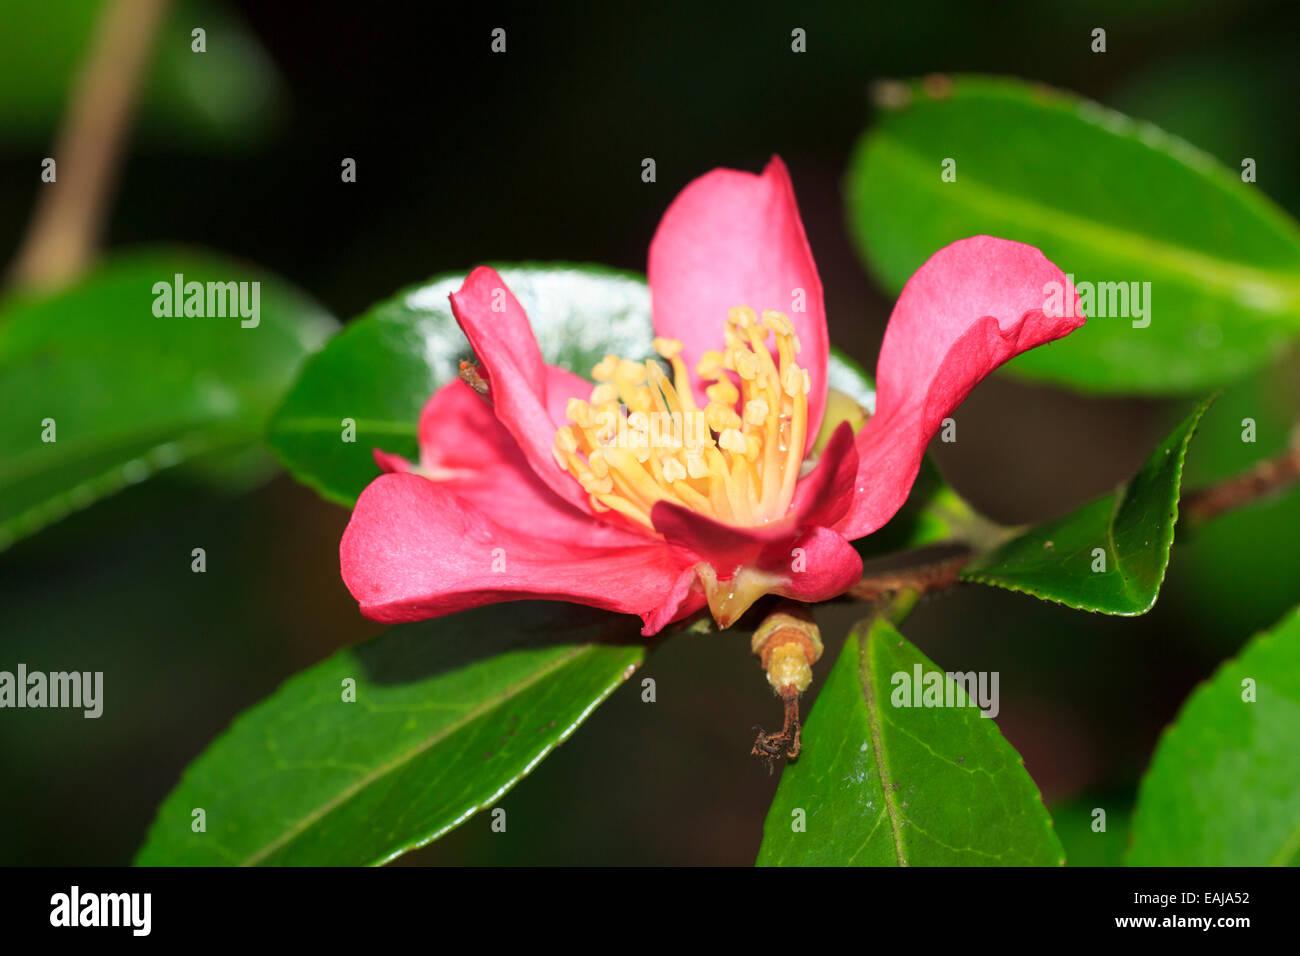 Single red autumn bloom of Camellia sasanqua 'Crimson King' - Stock Image